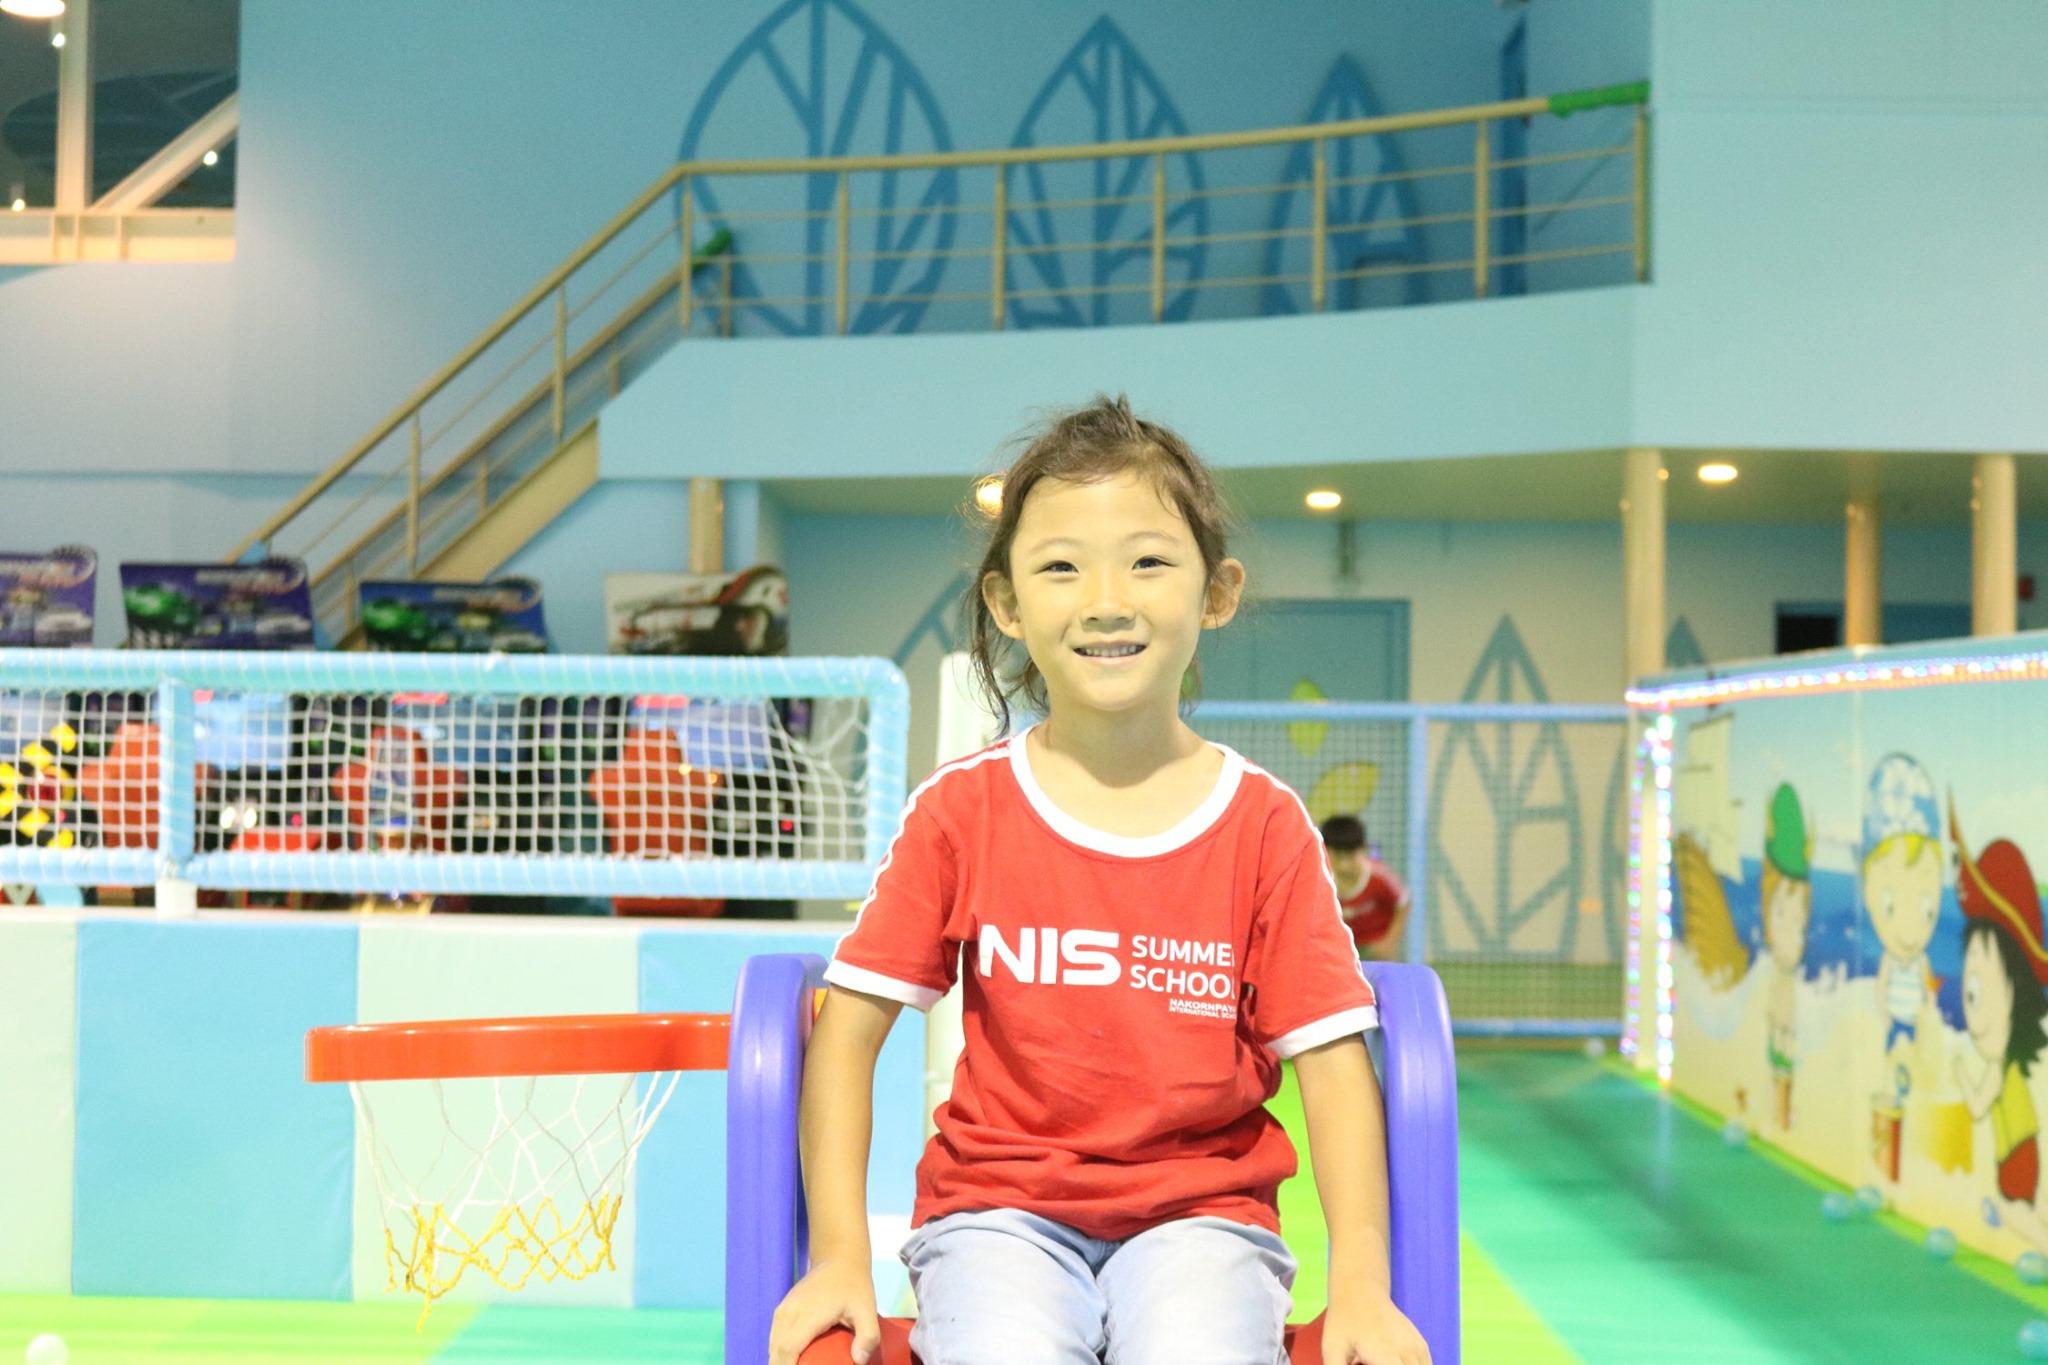 NIS-Summer-School-2019-Day-24-Kiddy-Land-10